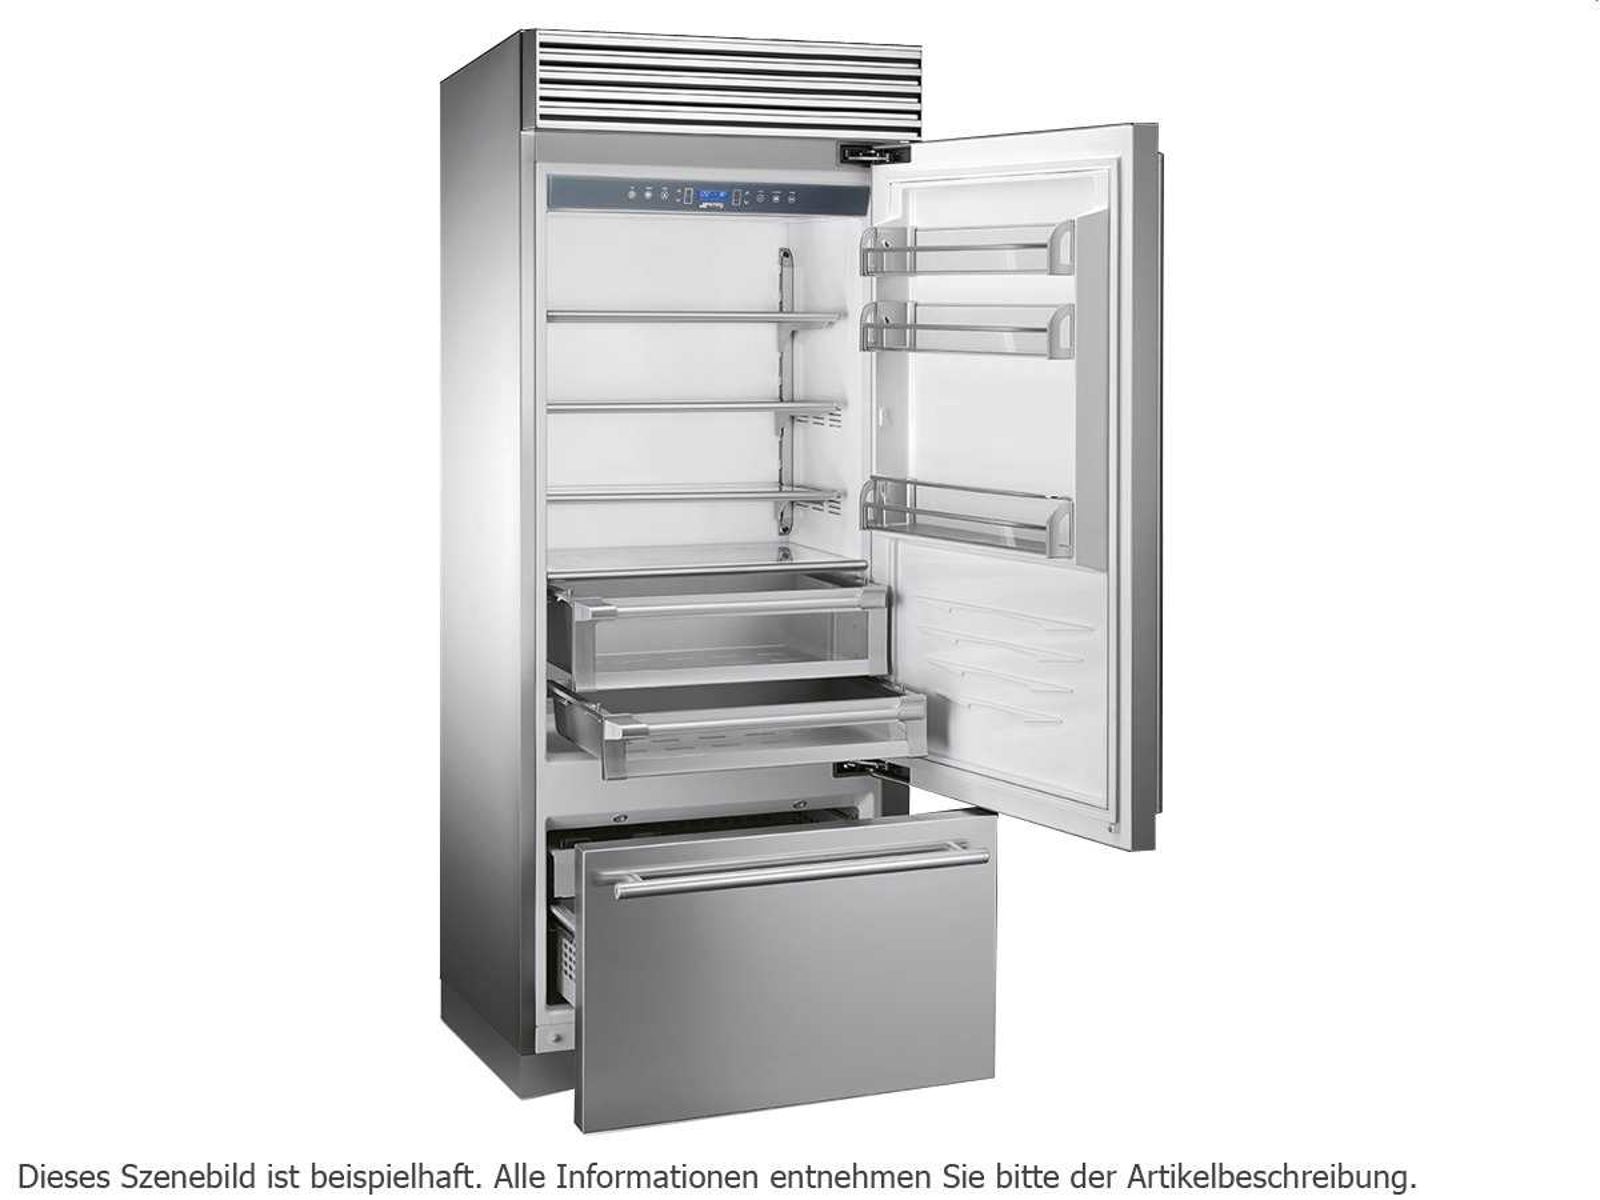 Smeg Kühlschrank Gefrierkombination : Kühl gefrierkombination mit schubladen medion kühl